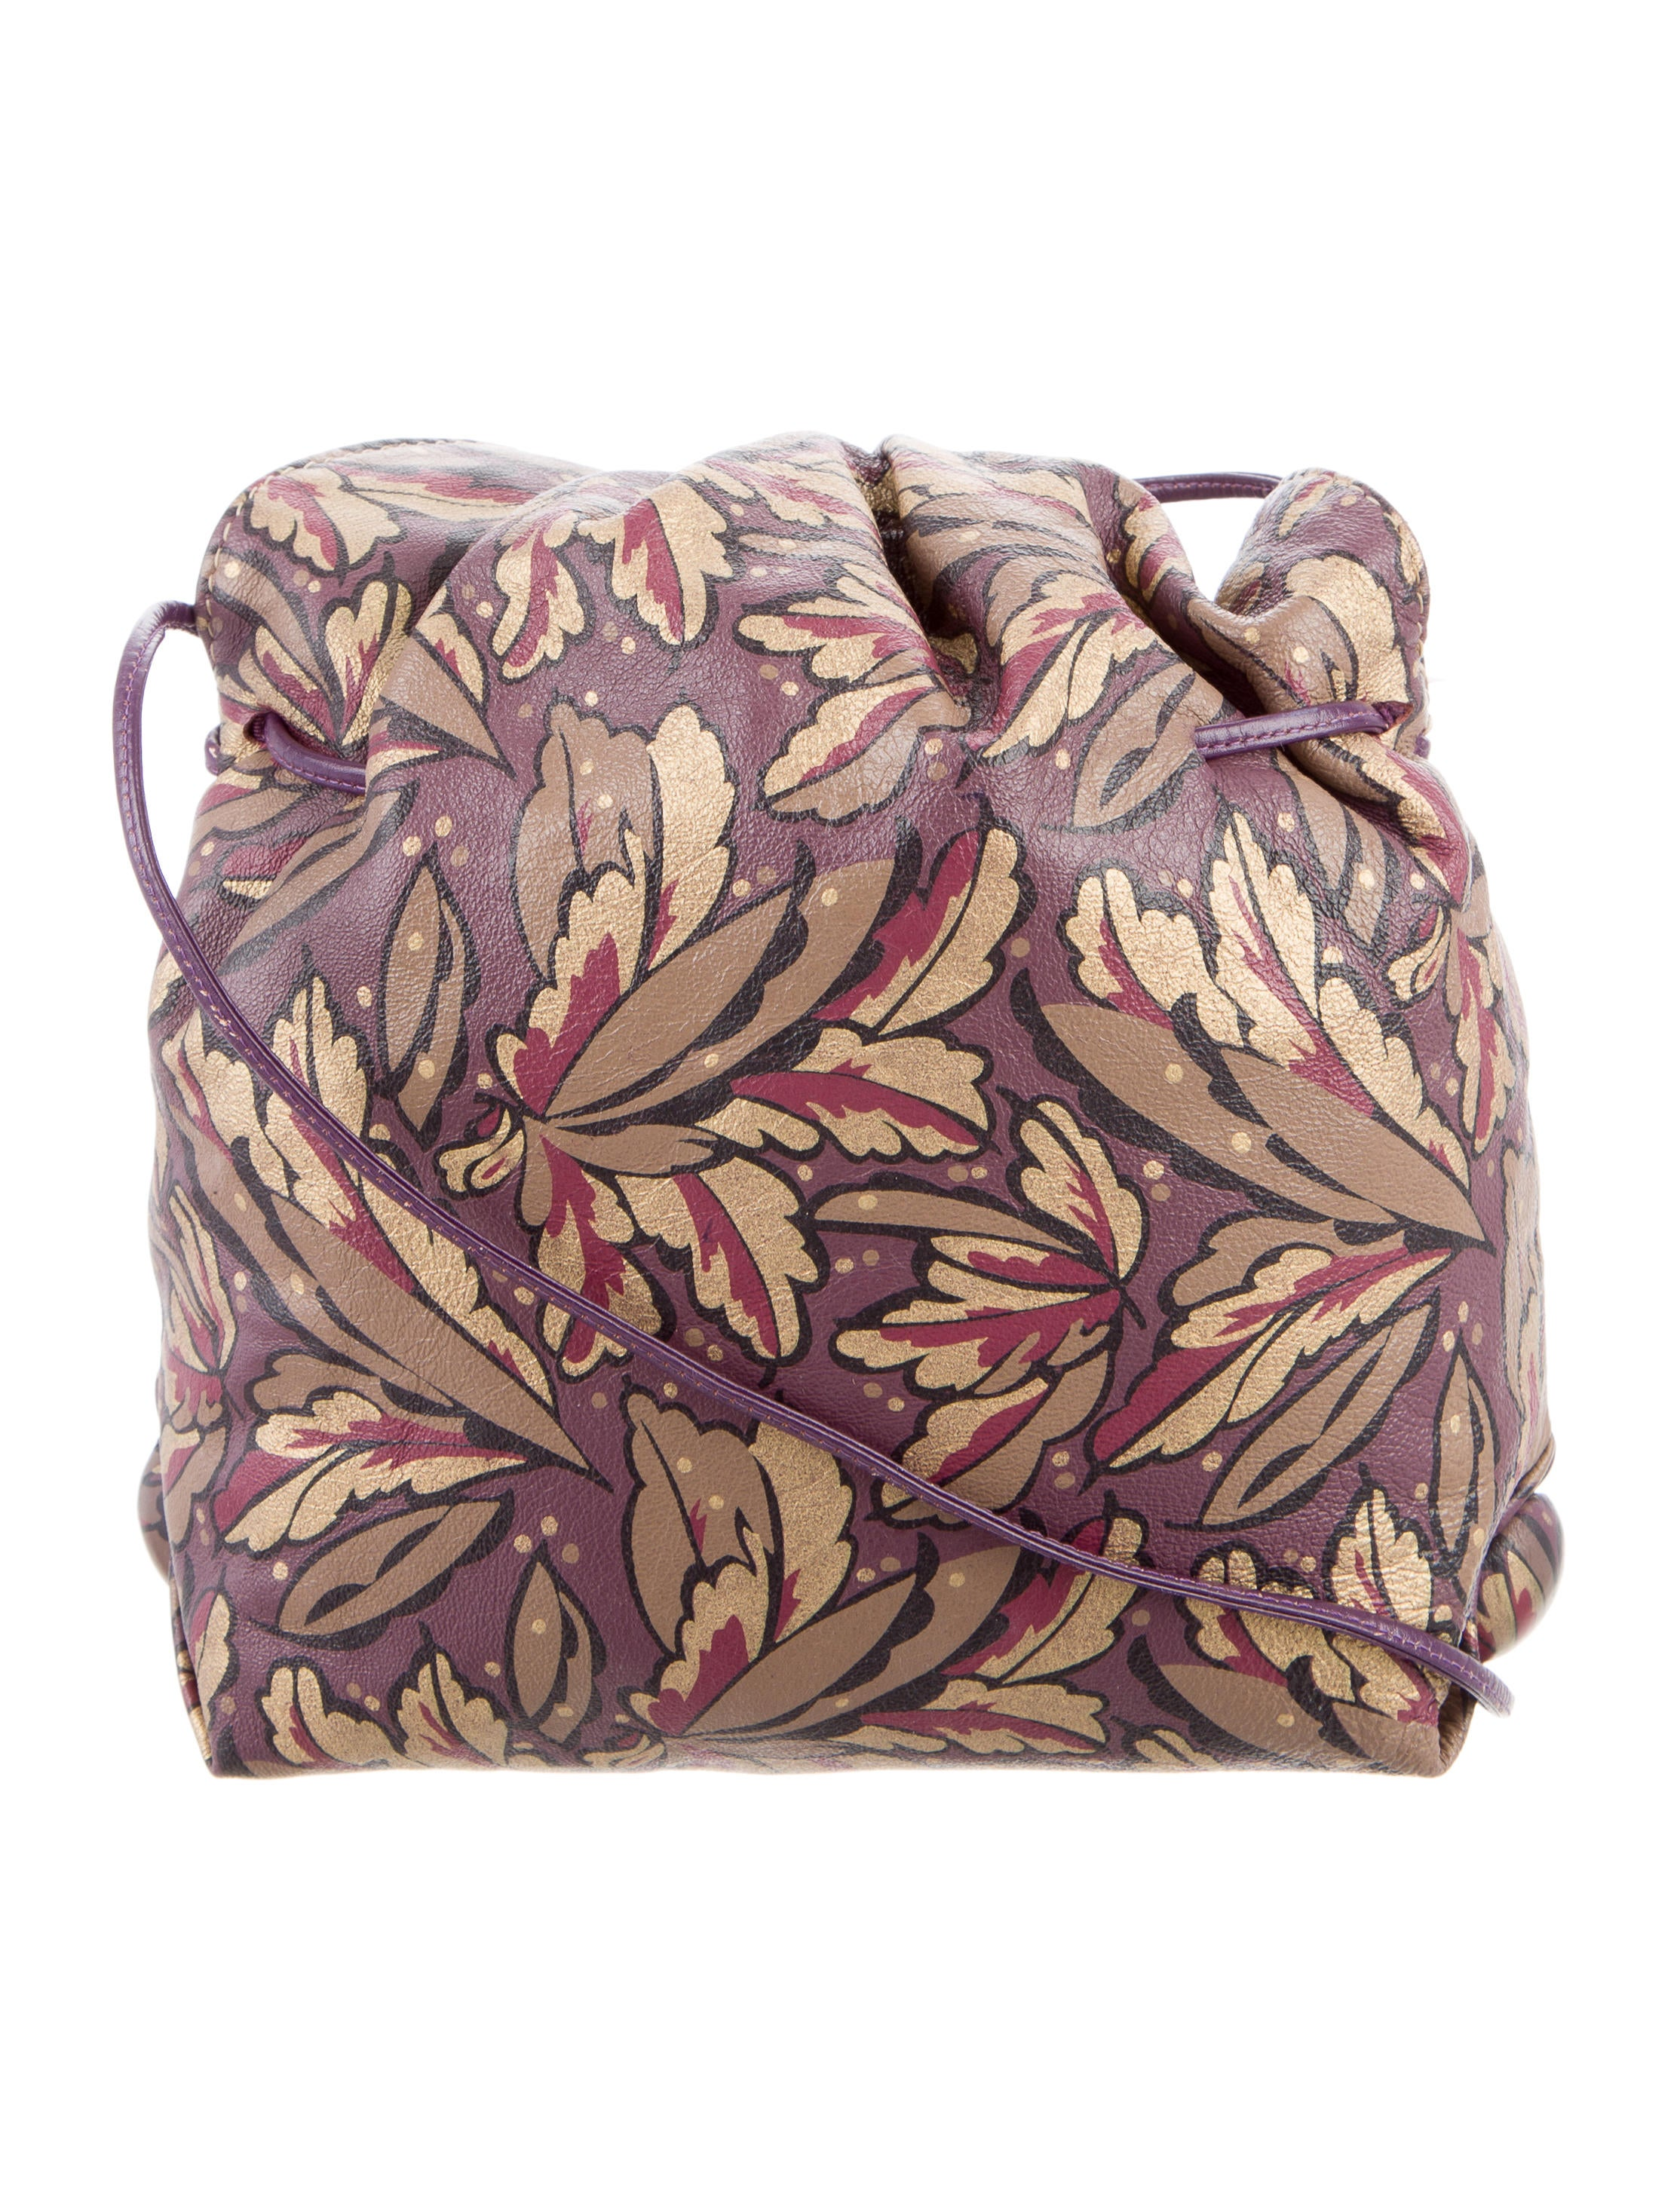 Carlos Falchi Floral Print Leather Crossbody Bag - Handbags - CAF21431 | The RealReal